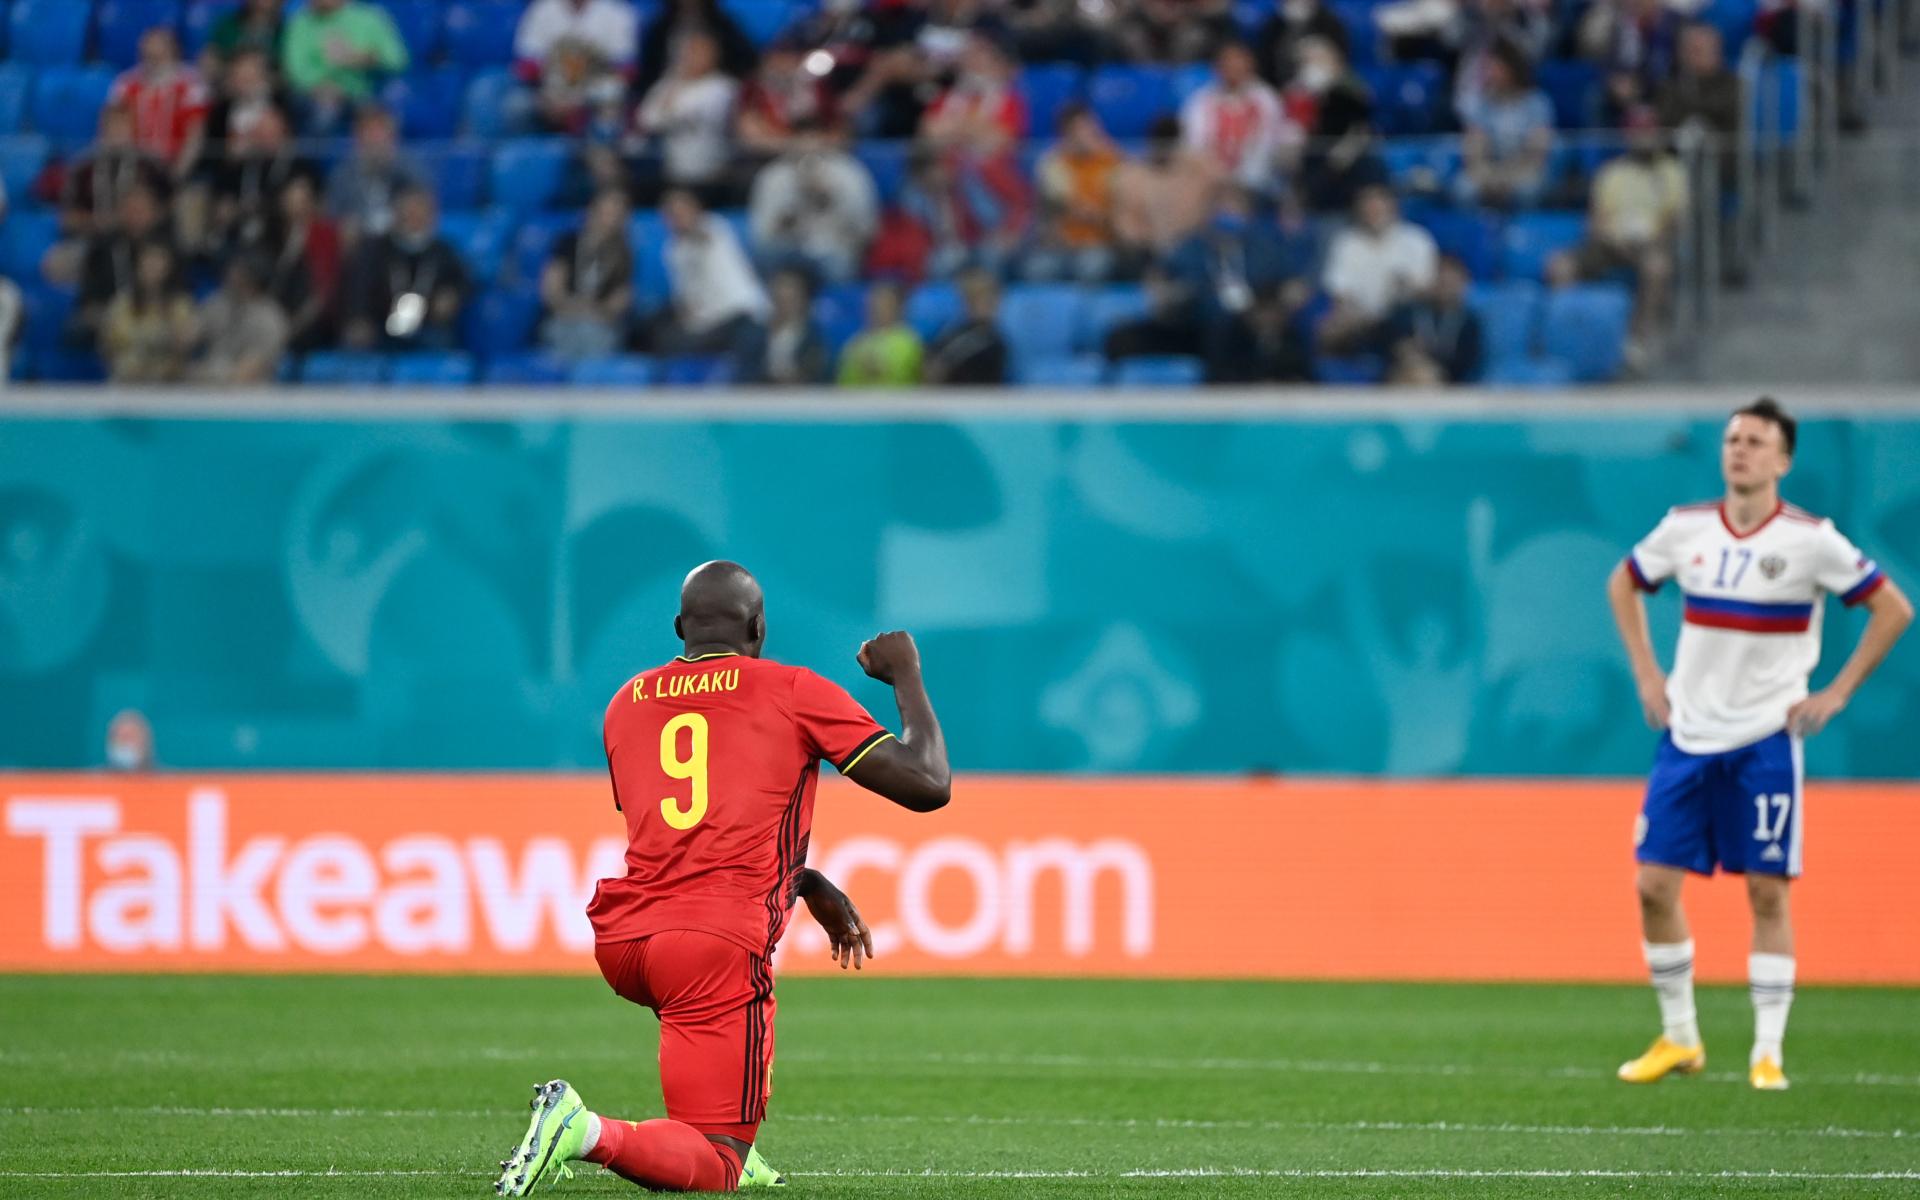 Фото: Перед началом матча Бельгия - России (Global Look Press)